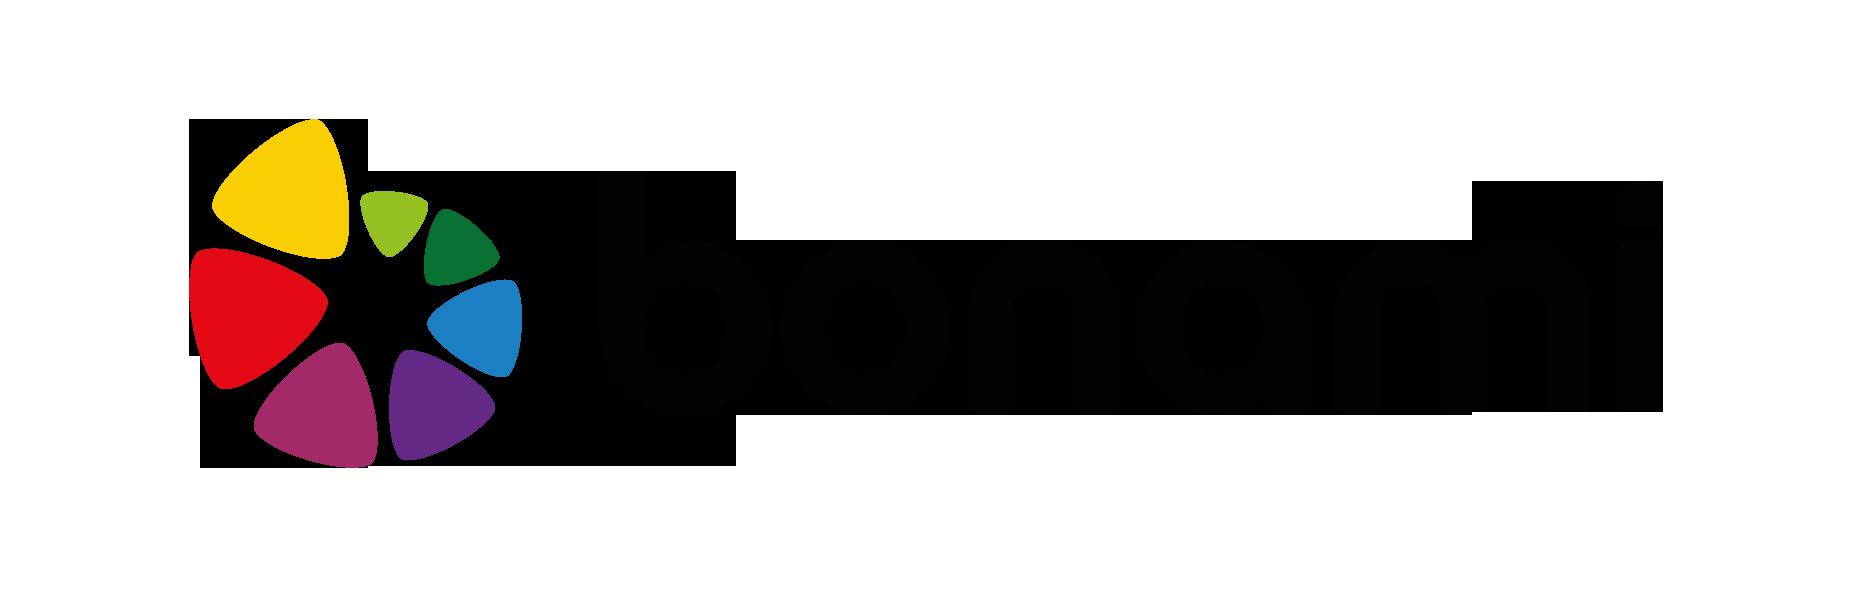 Spolupráce s Bonami.